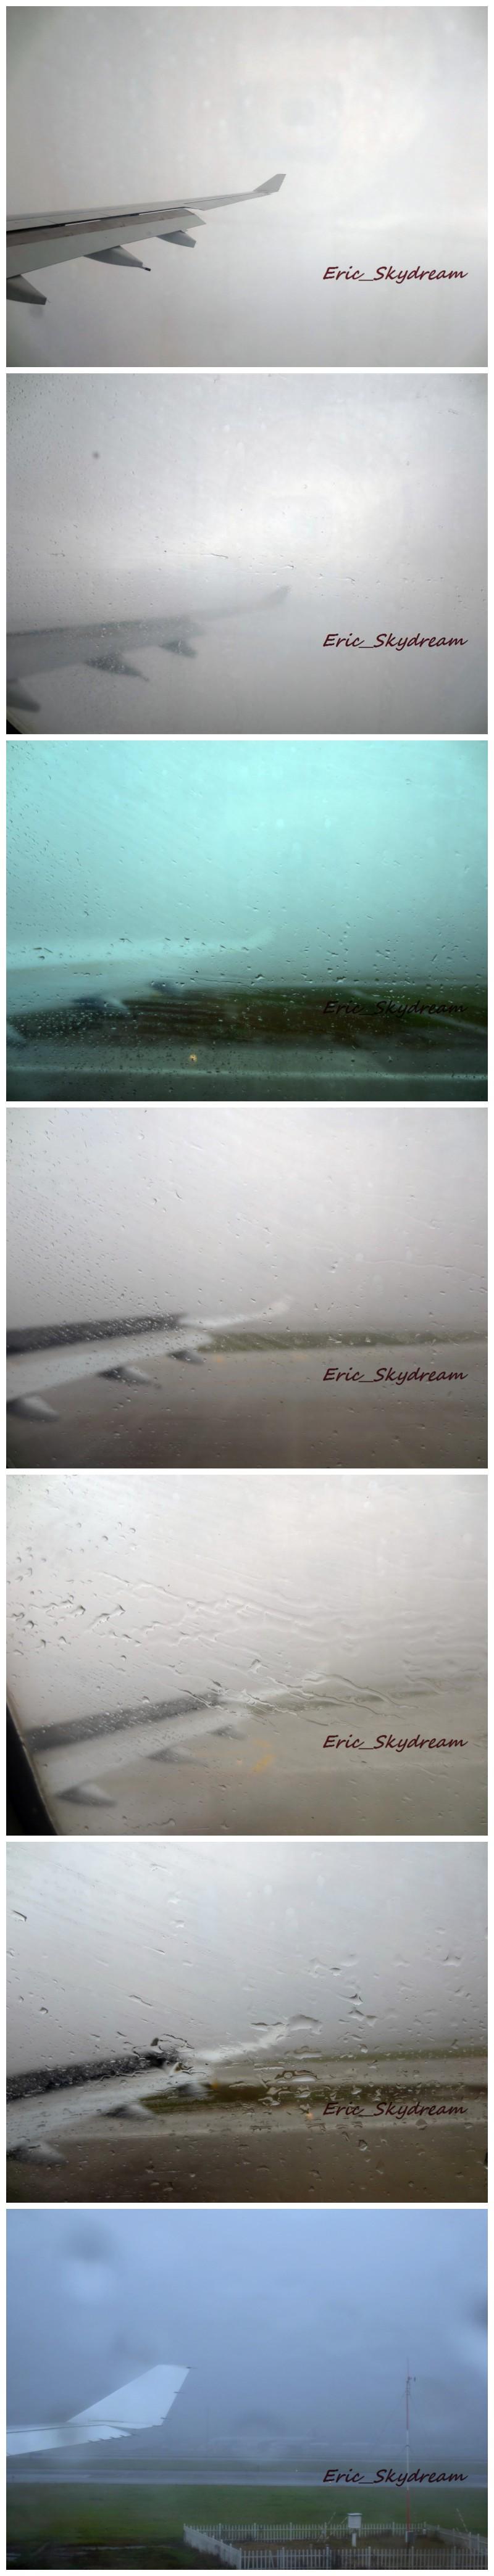 Re:[原创]<Eric's Journal> 01 飞雪 伙伴 御风长安之旅 新人首篇游记